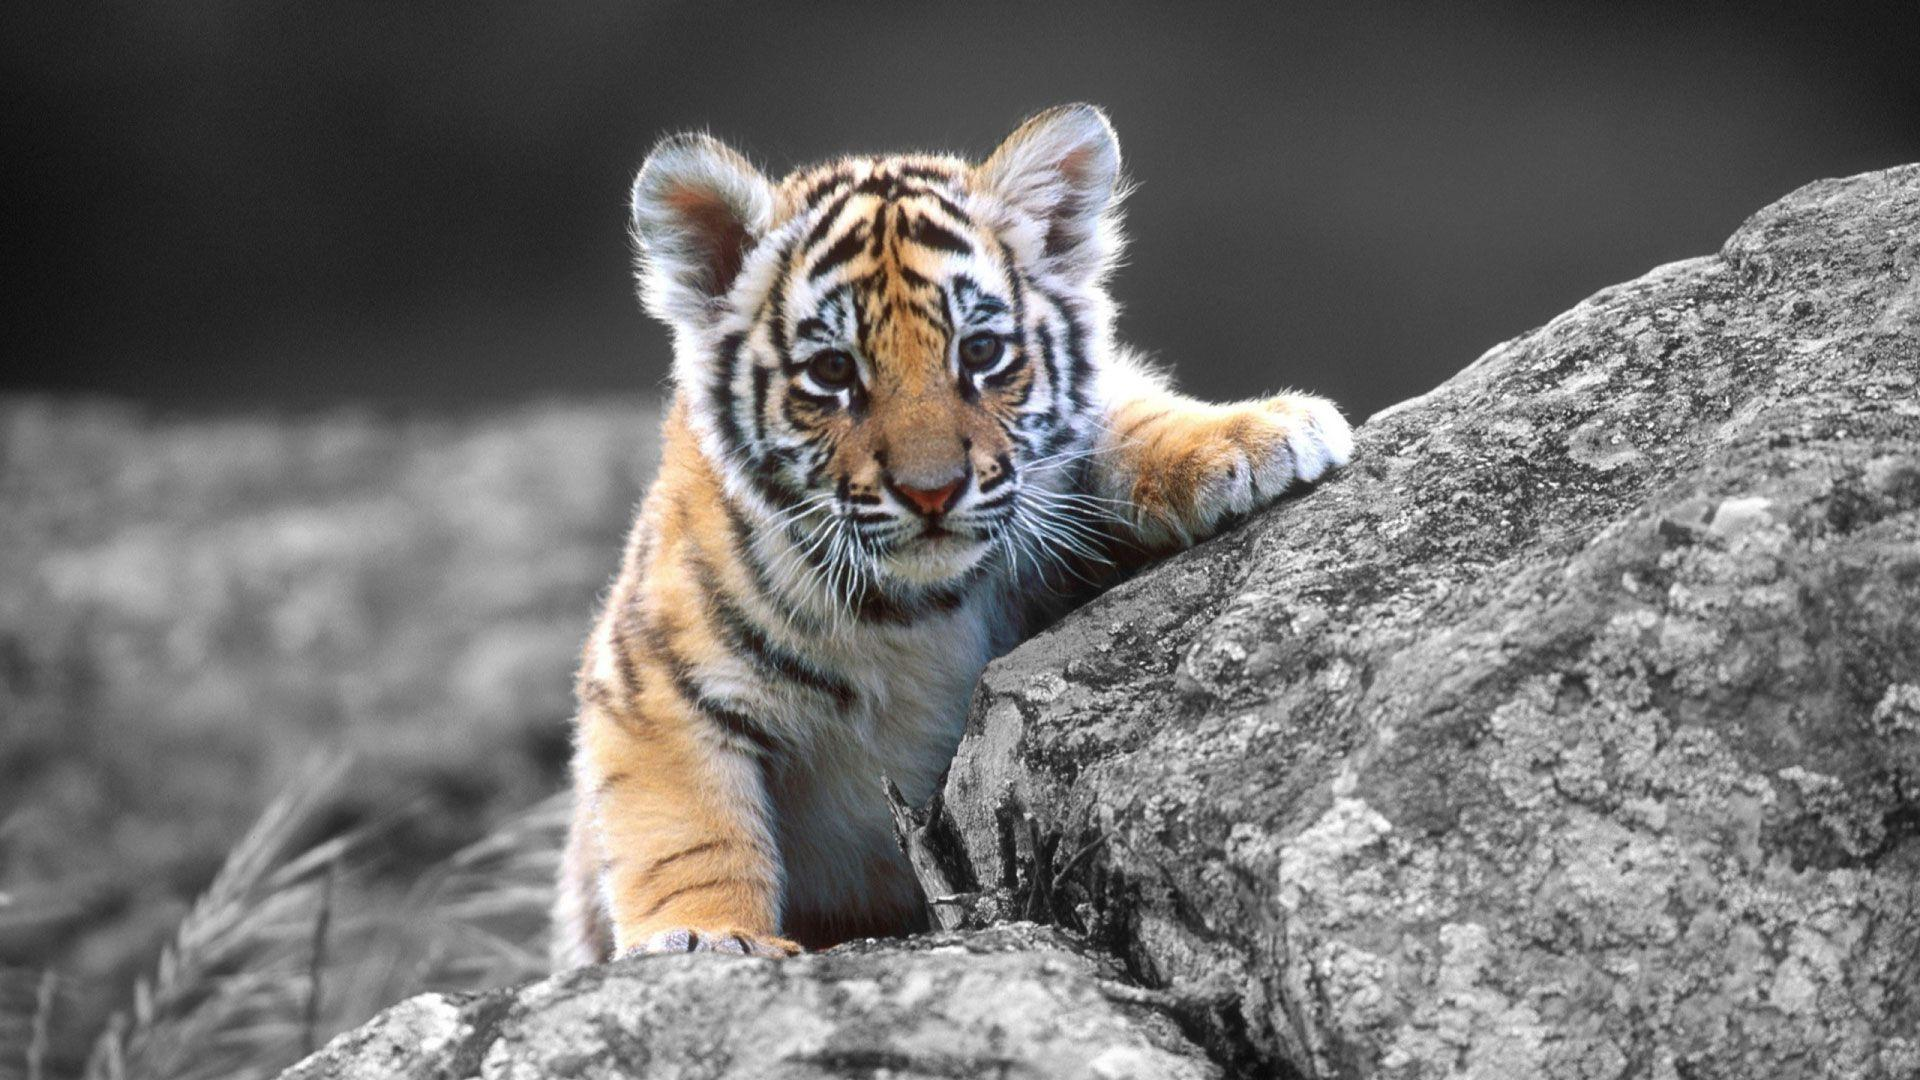 www tiger photo com